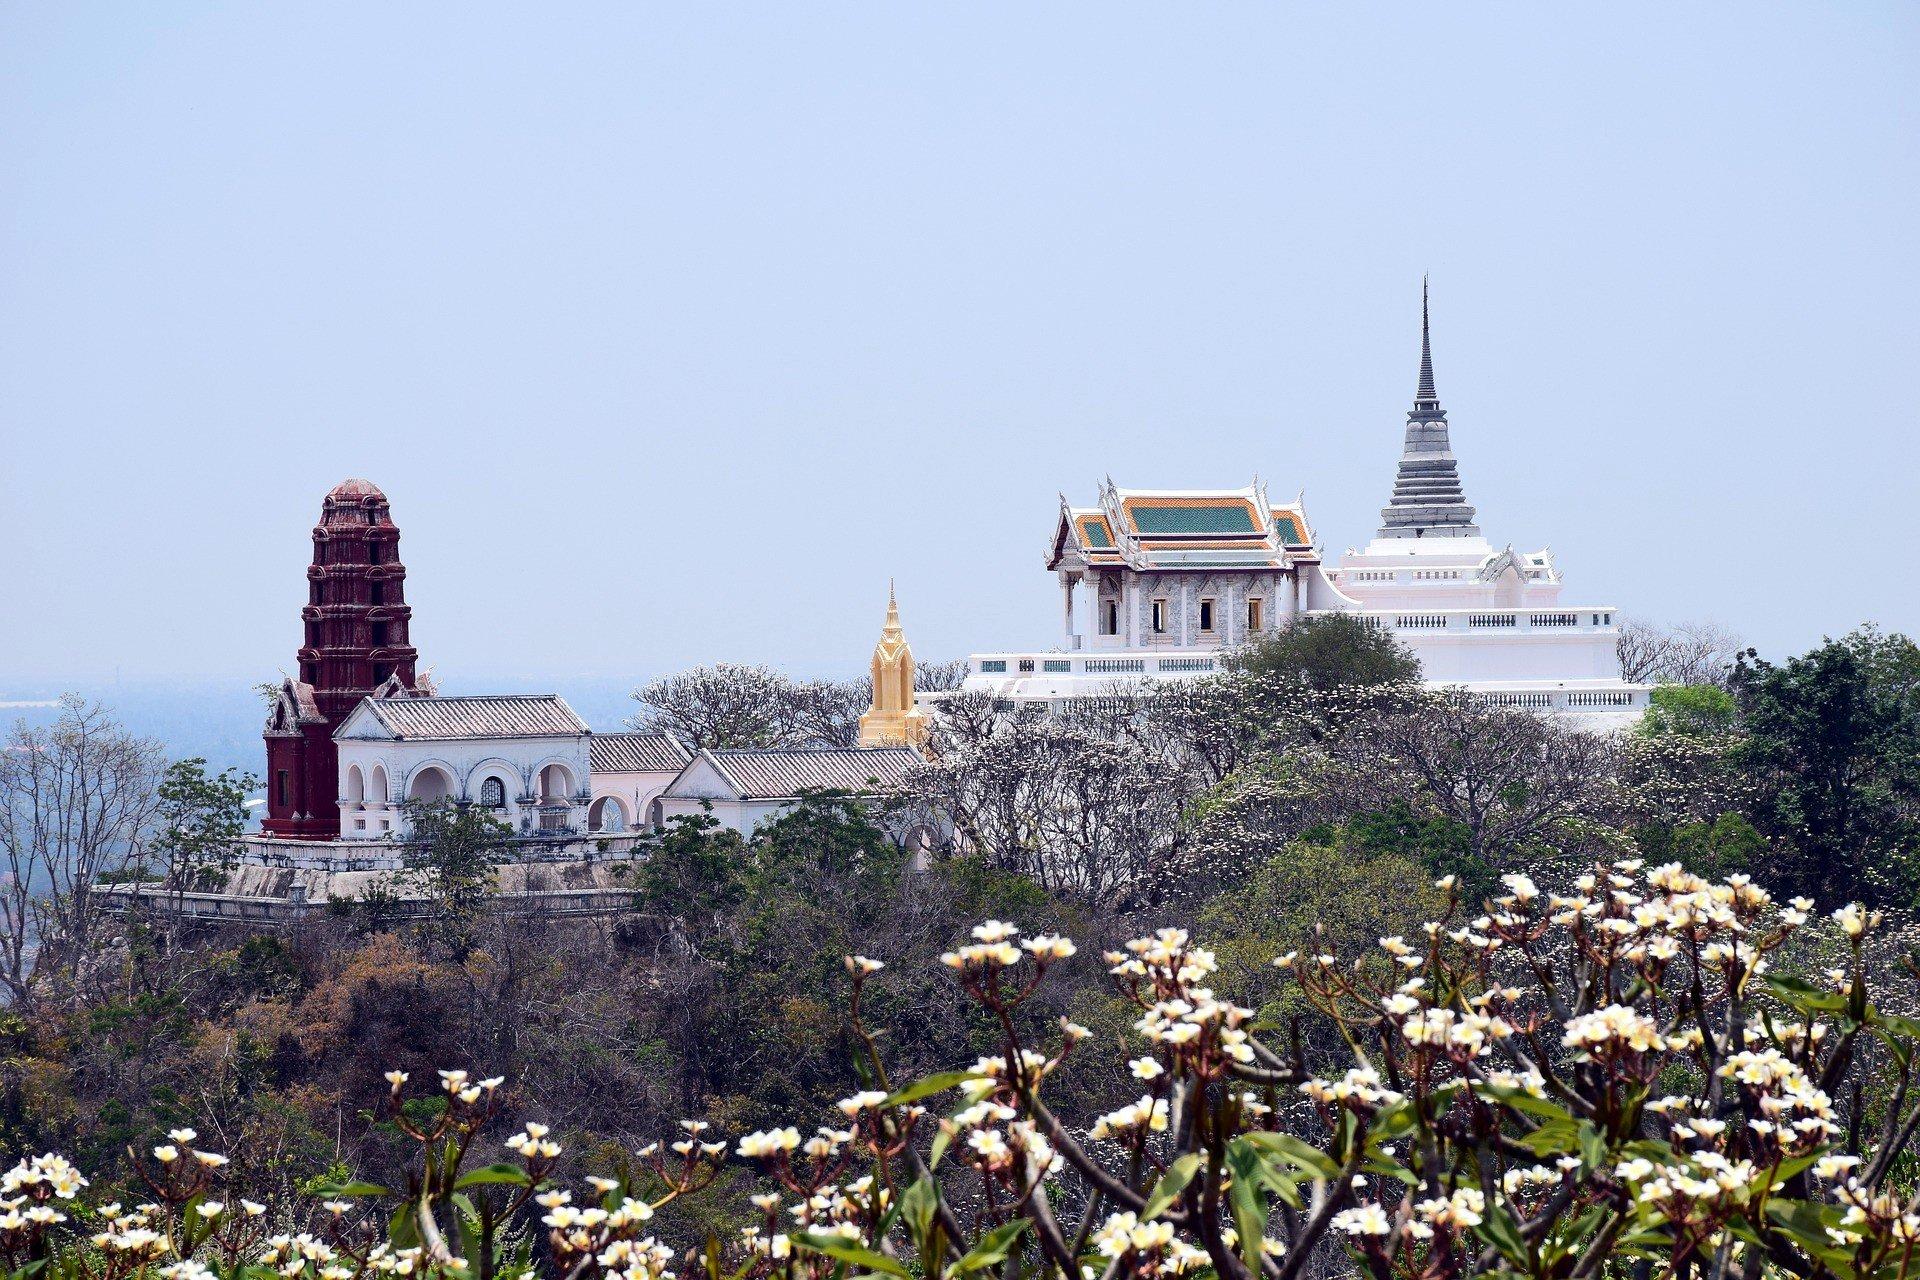 Phra Nakhon Khiri Palace in Phetchaburi